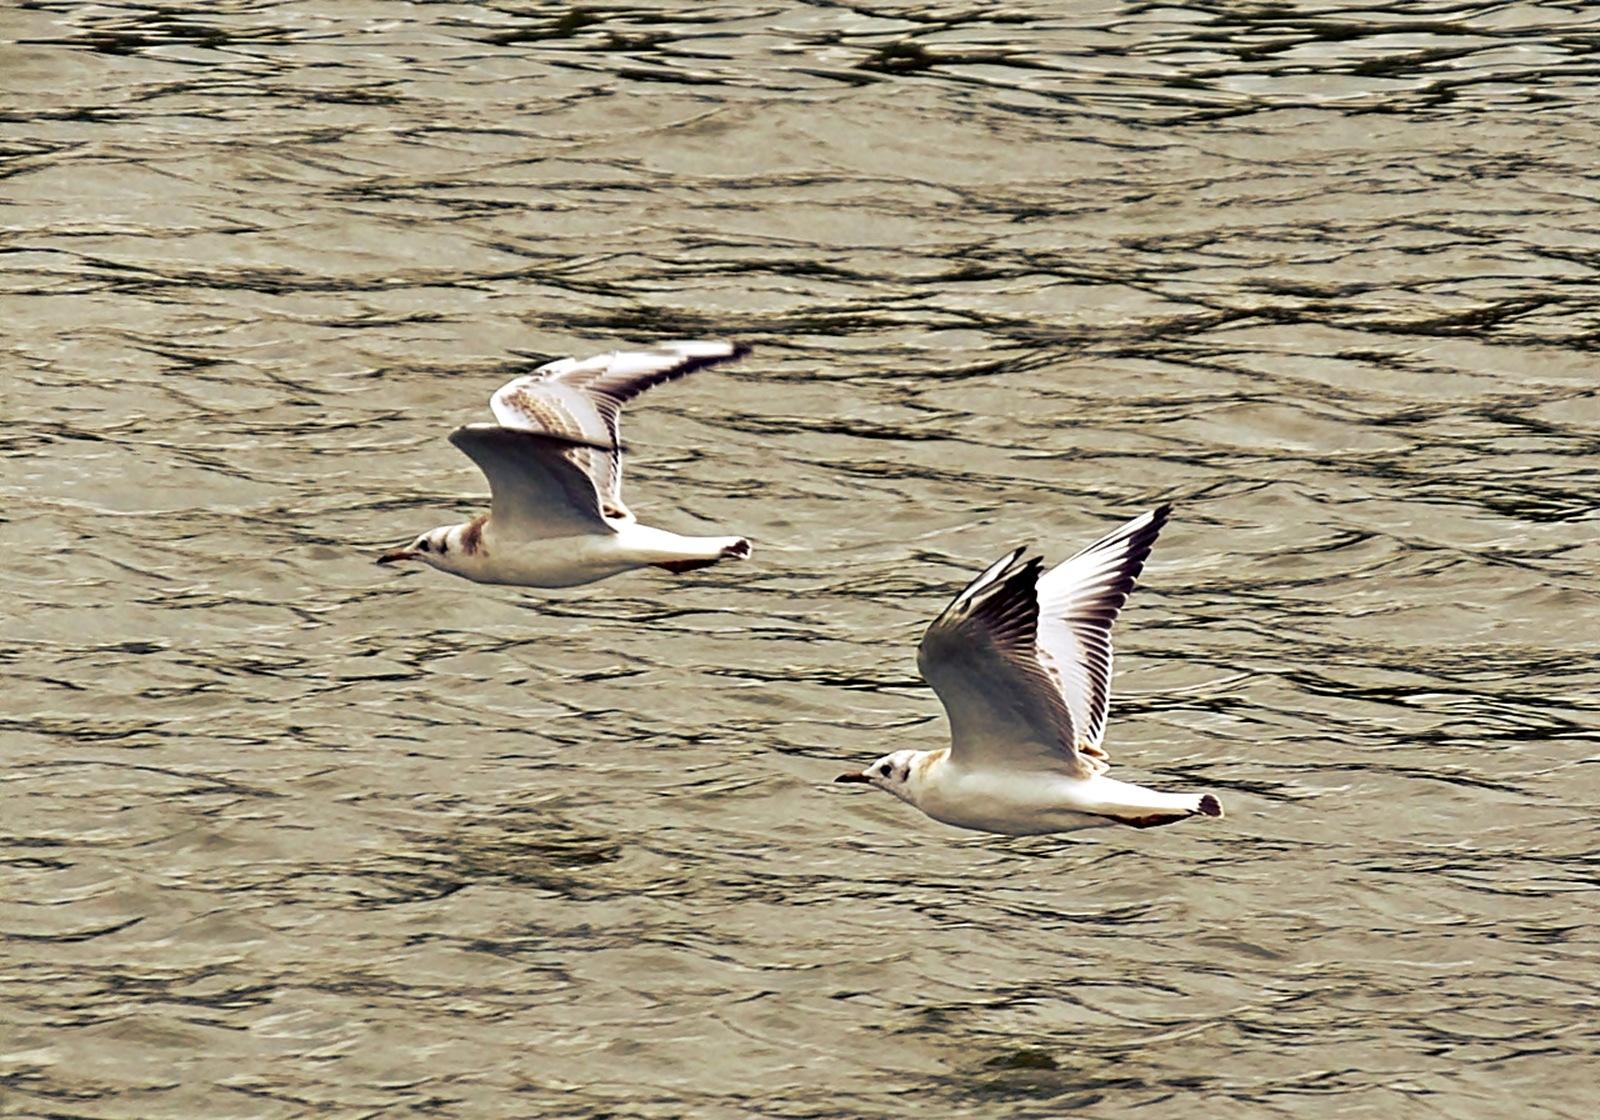 Seagulls flying by nancydev